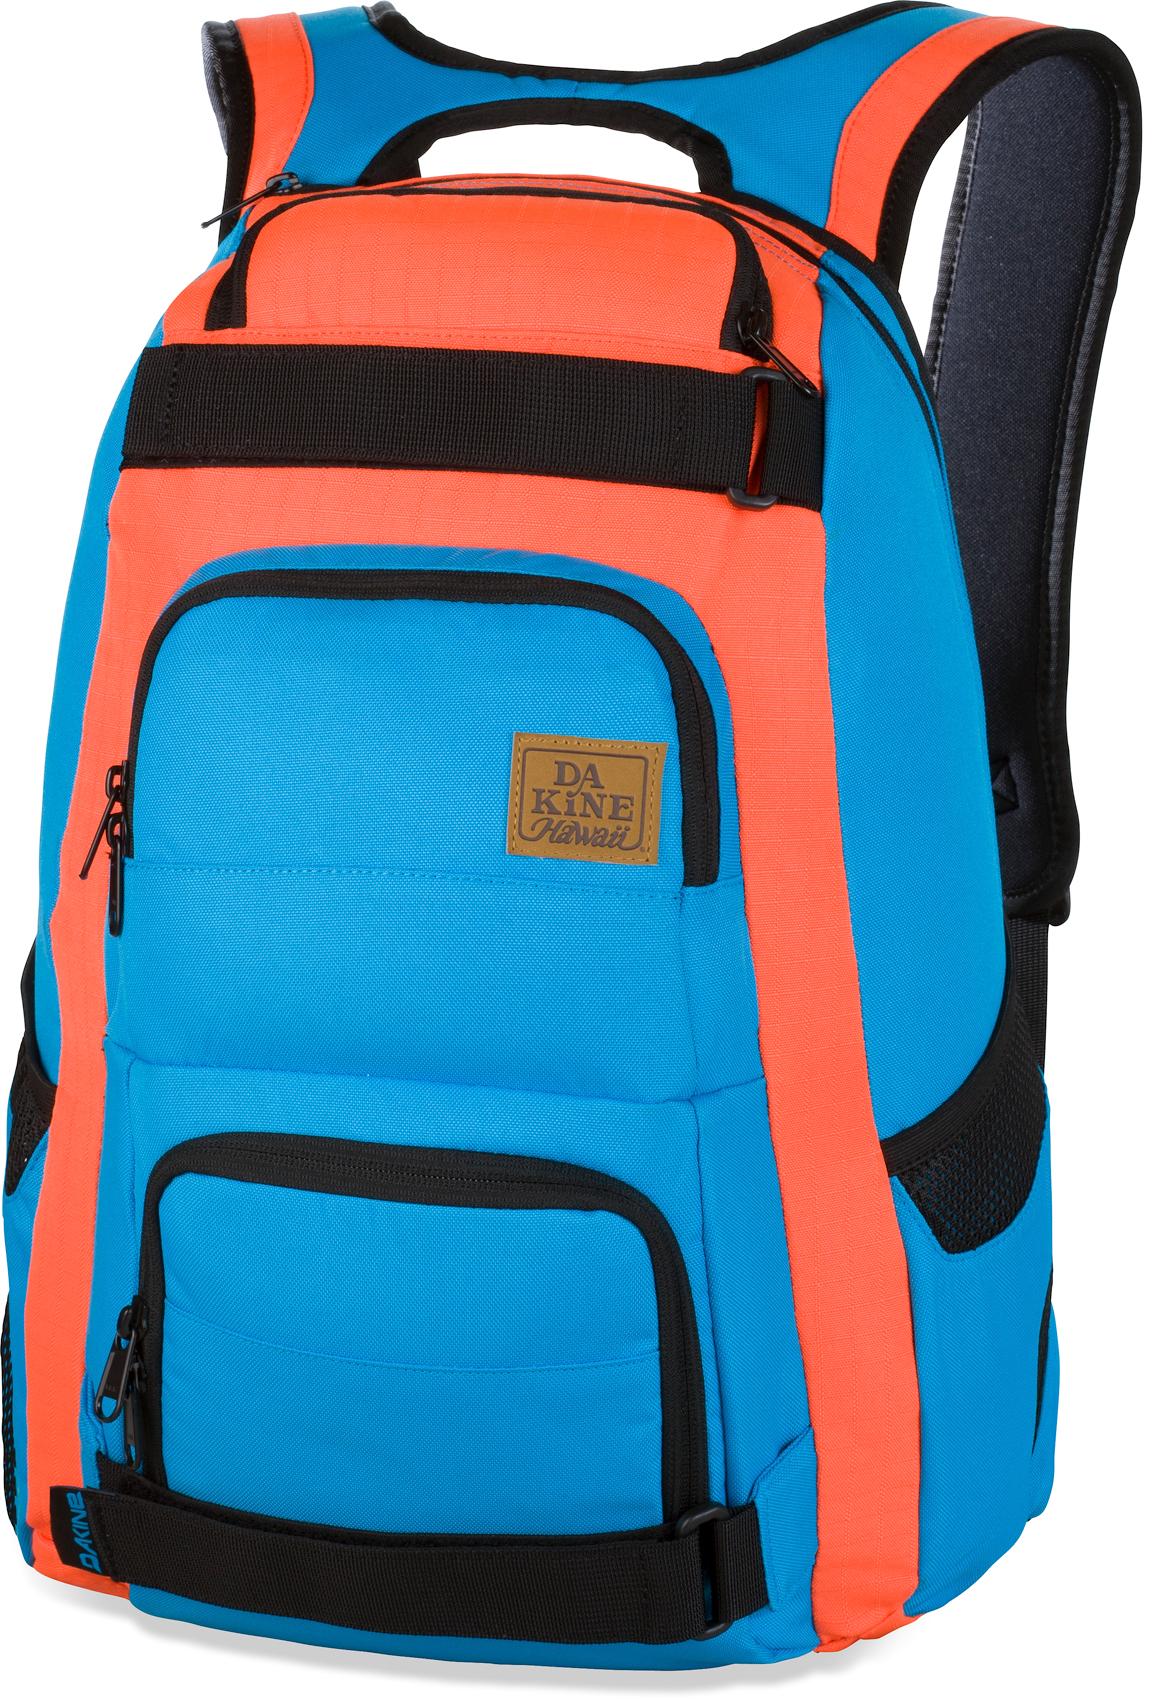 Dakine Duel Backpack 26L 2014 Offshore | | Mens | The Board Basement